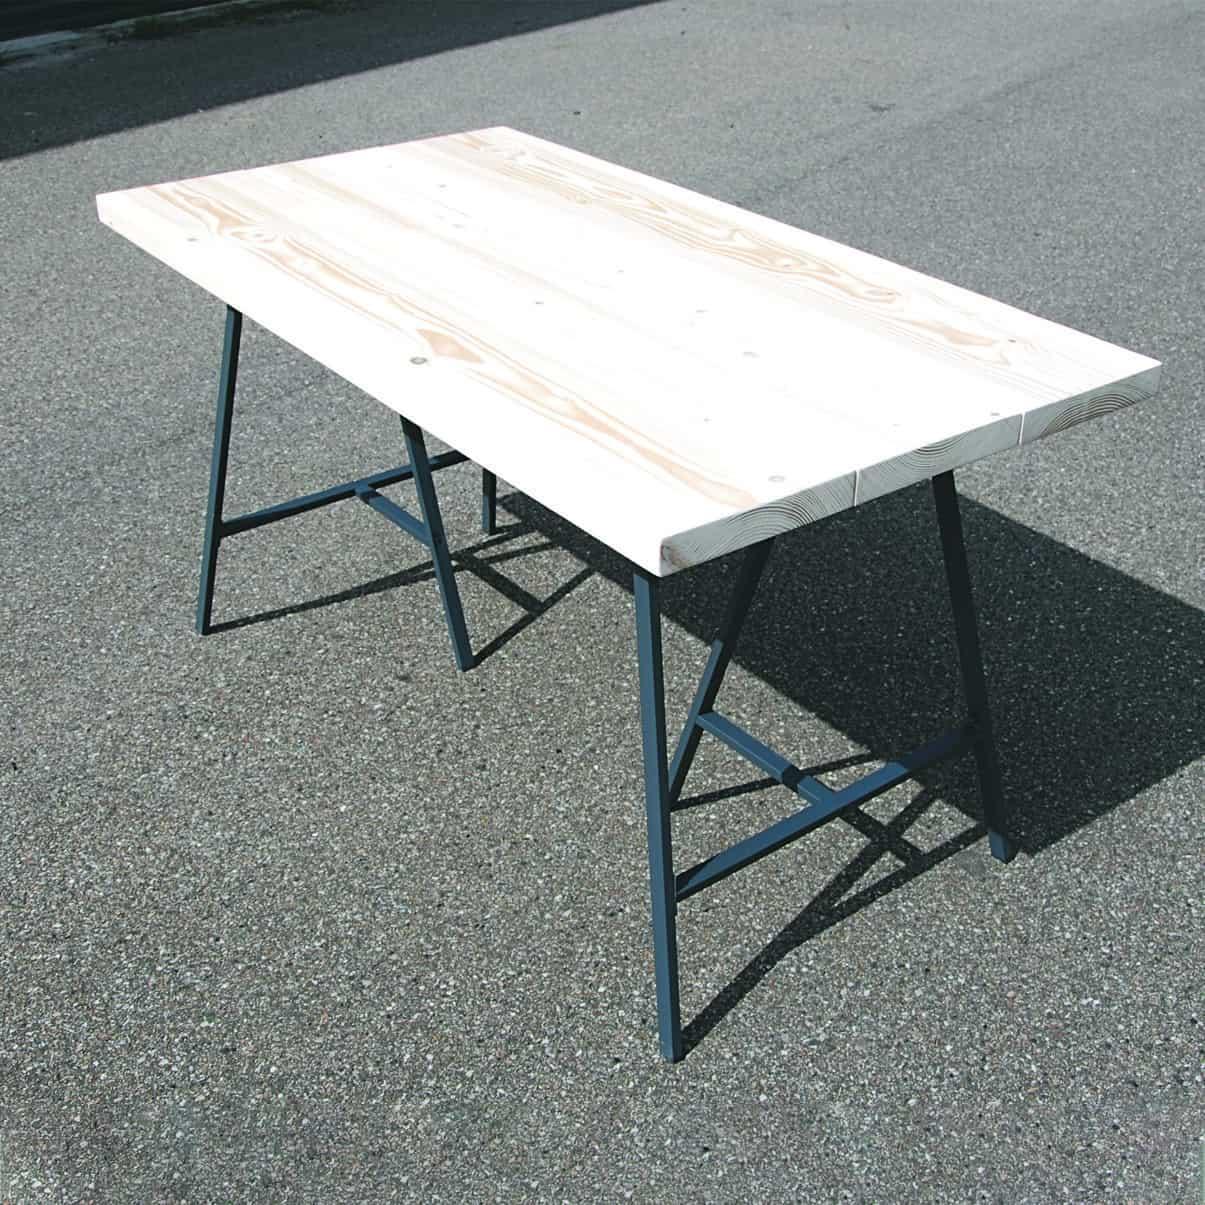 Lyst skrivebord, plankebord